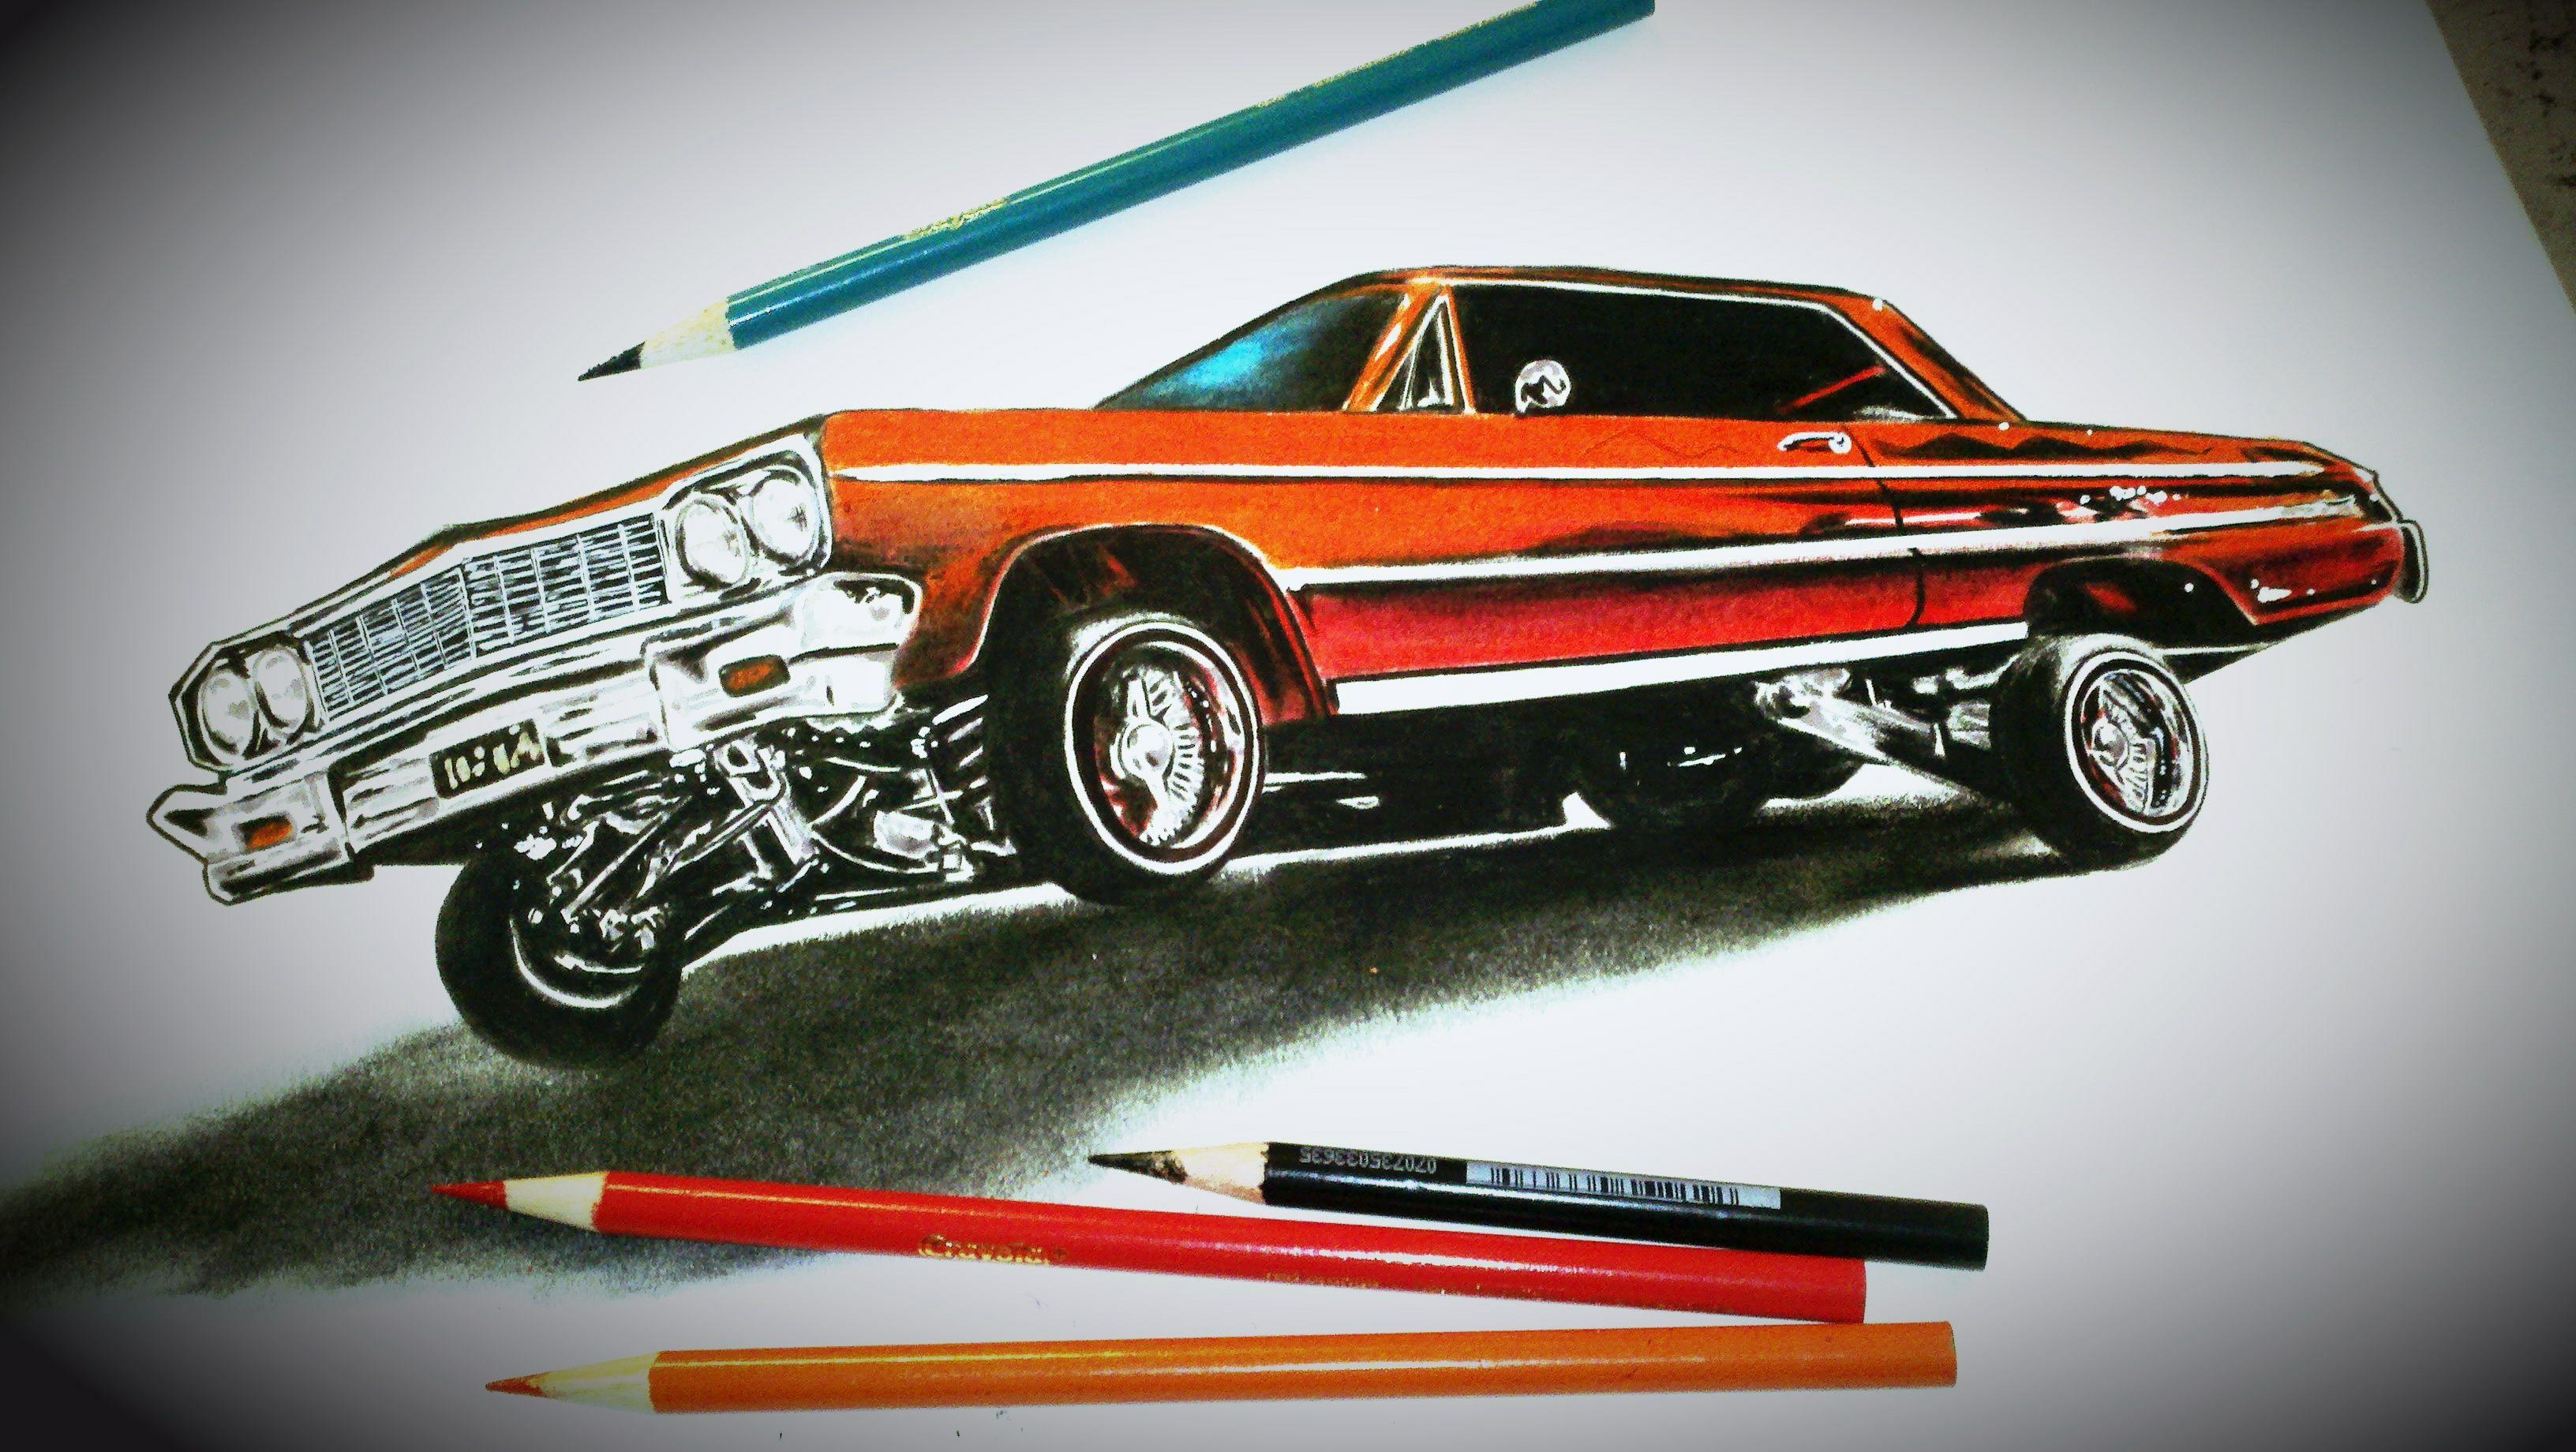 3264x1840 Cool Drawing Lowriders Custom Cars Gangster Lowrider Cars